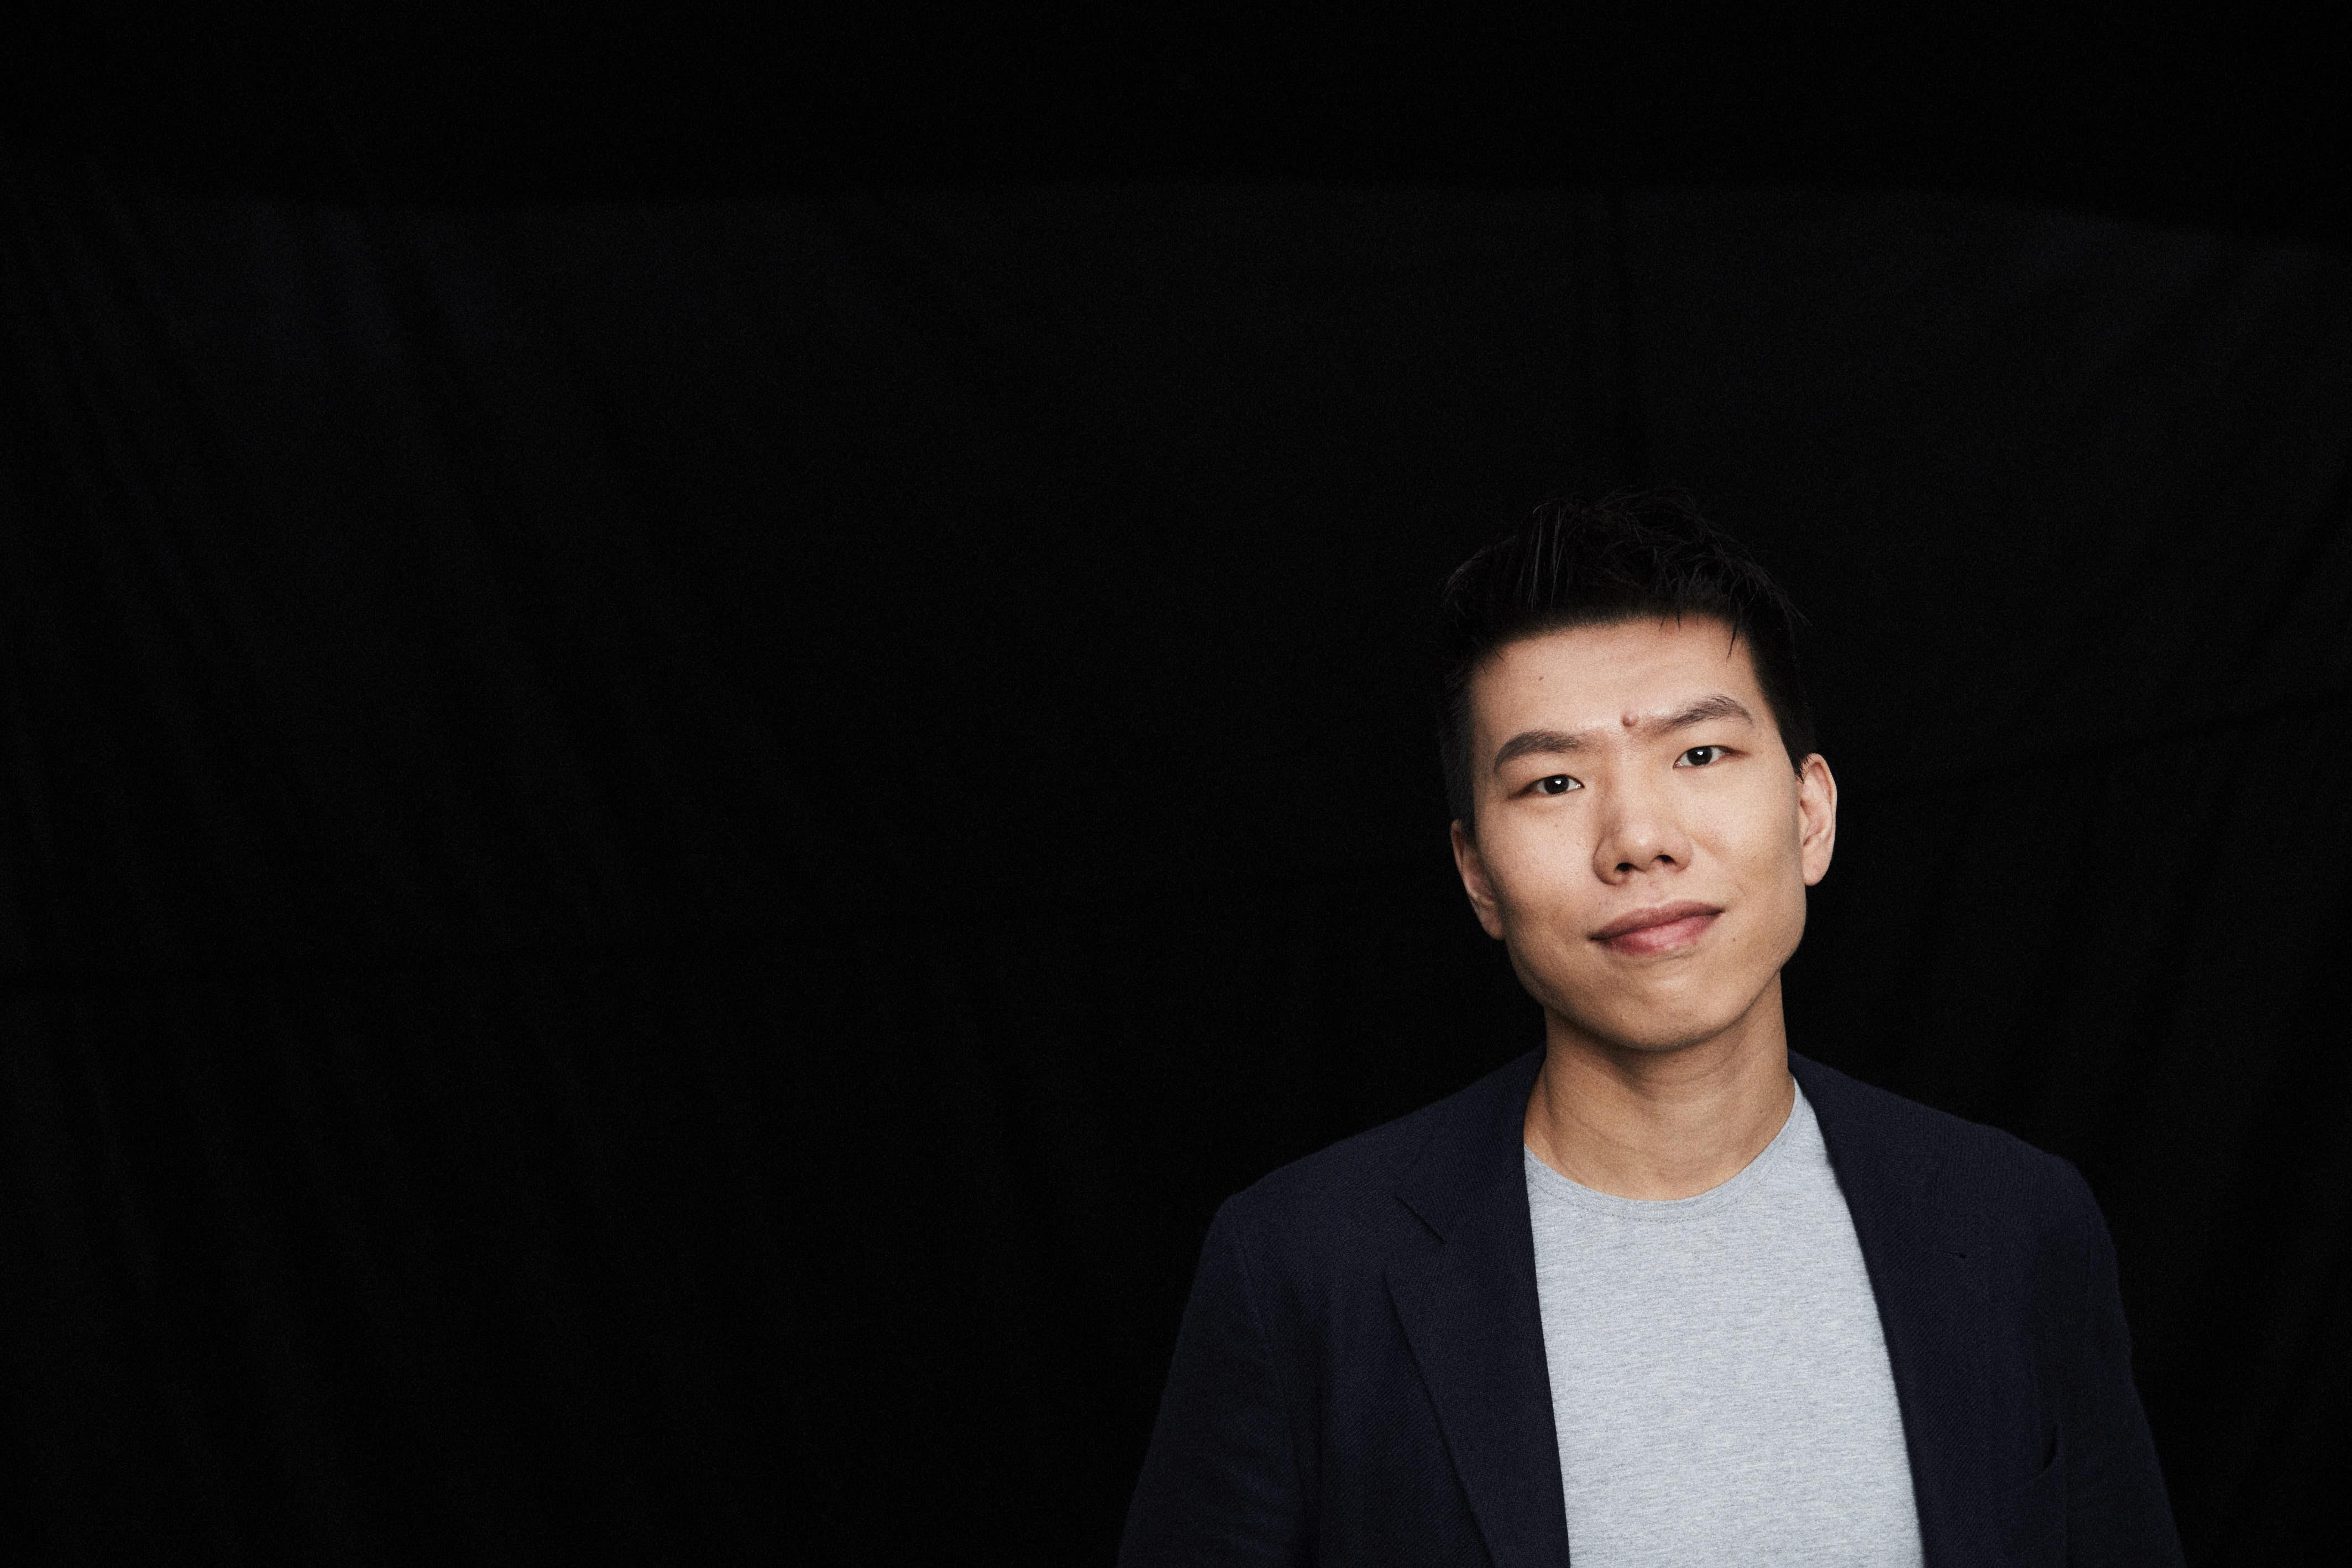 Ming Zeng, editorial director of GQ China